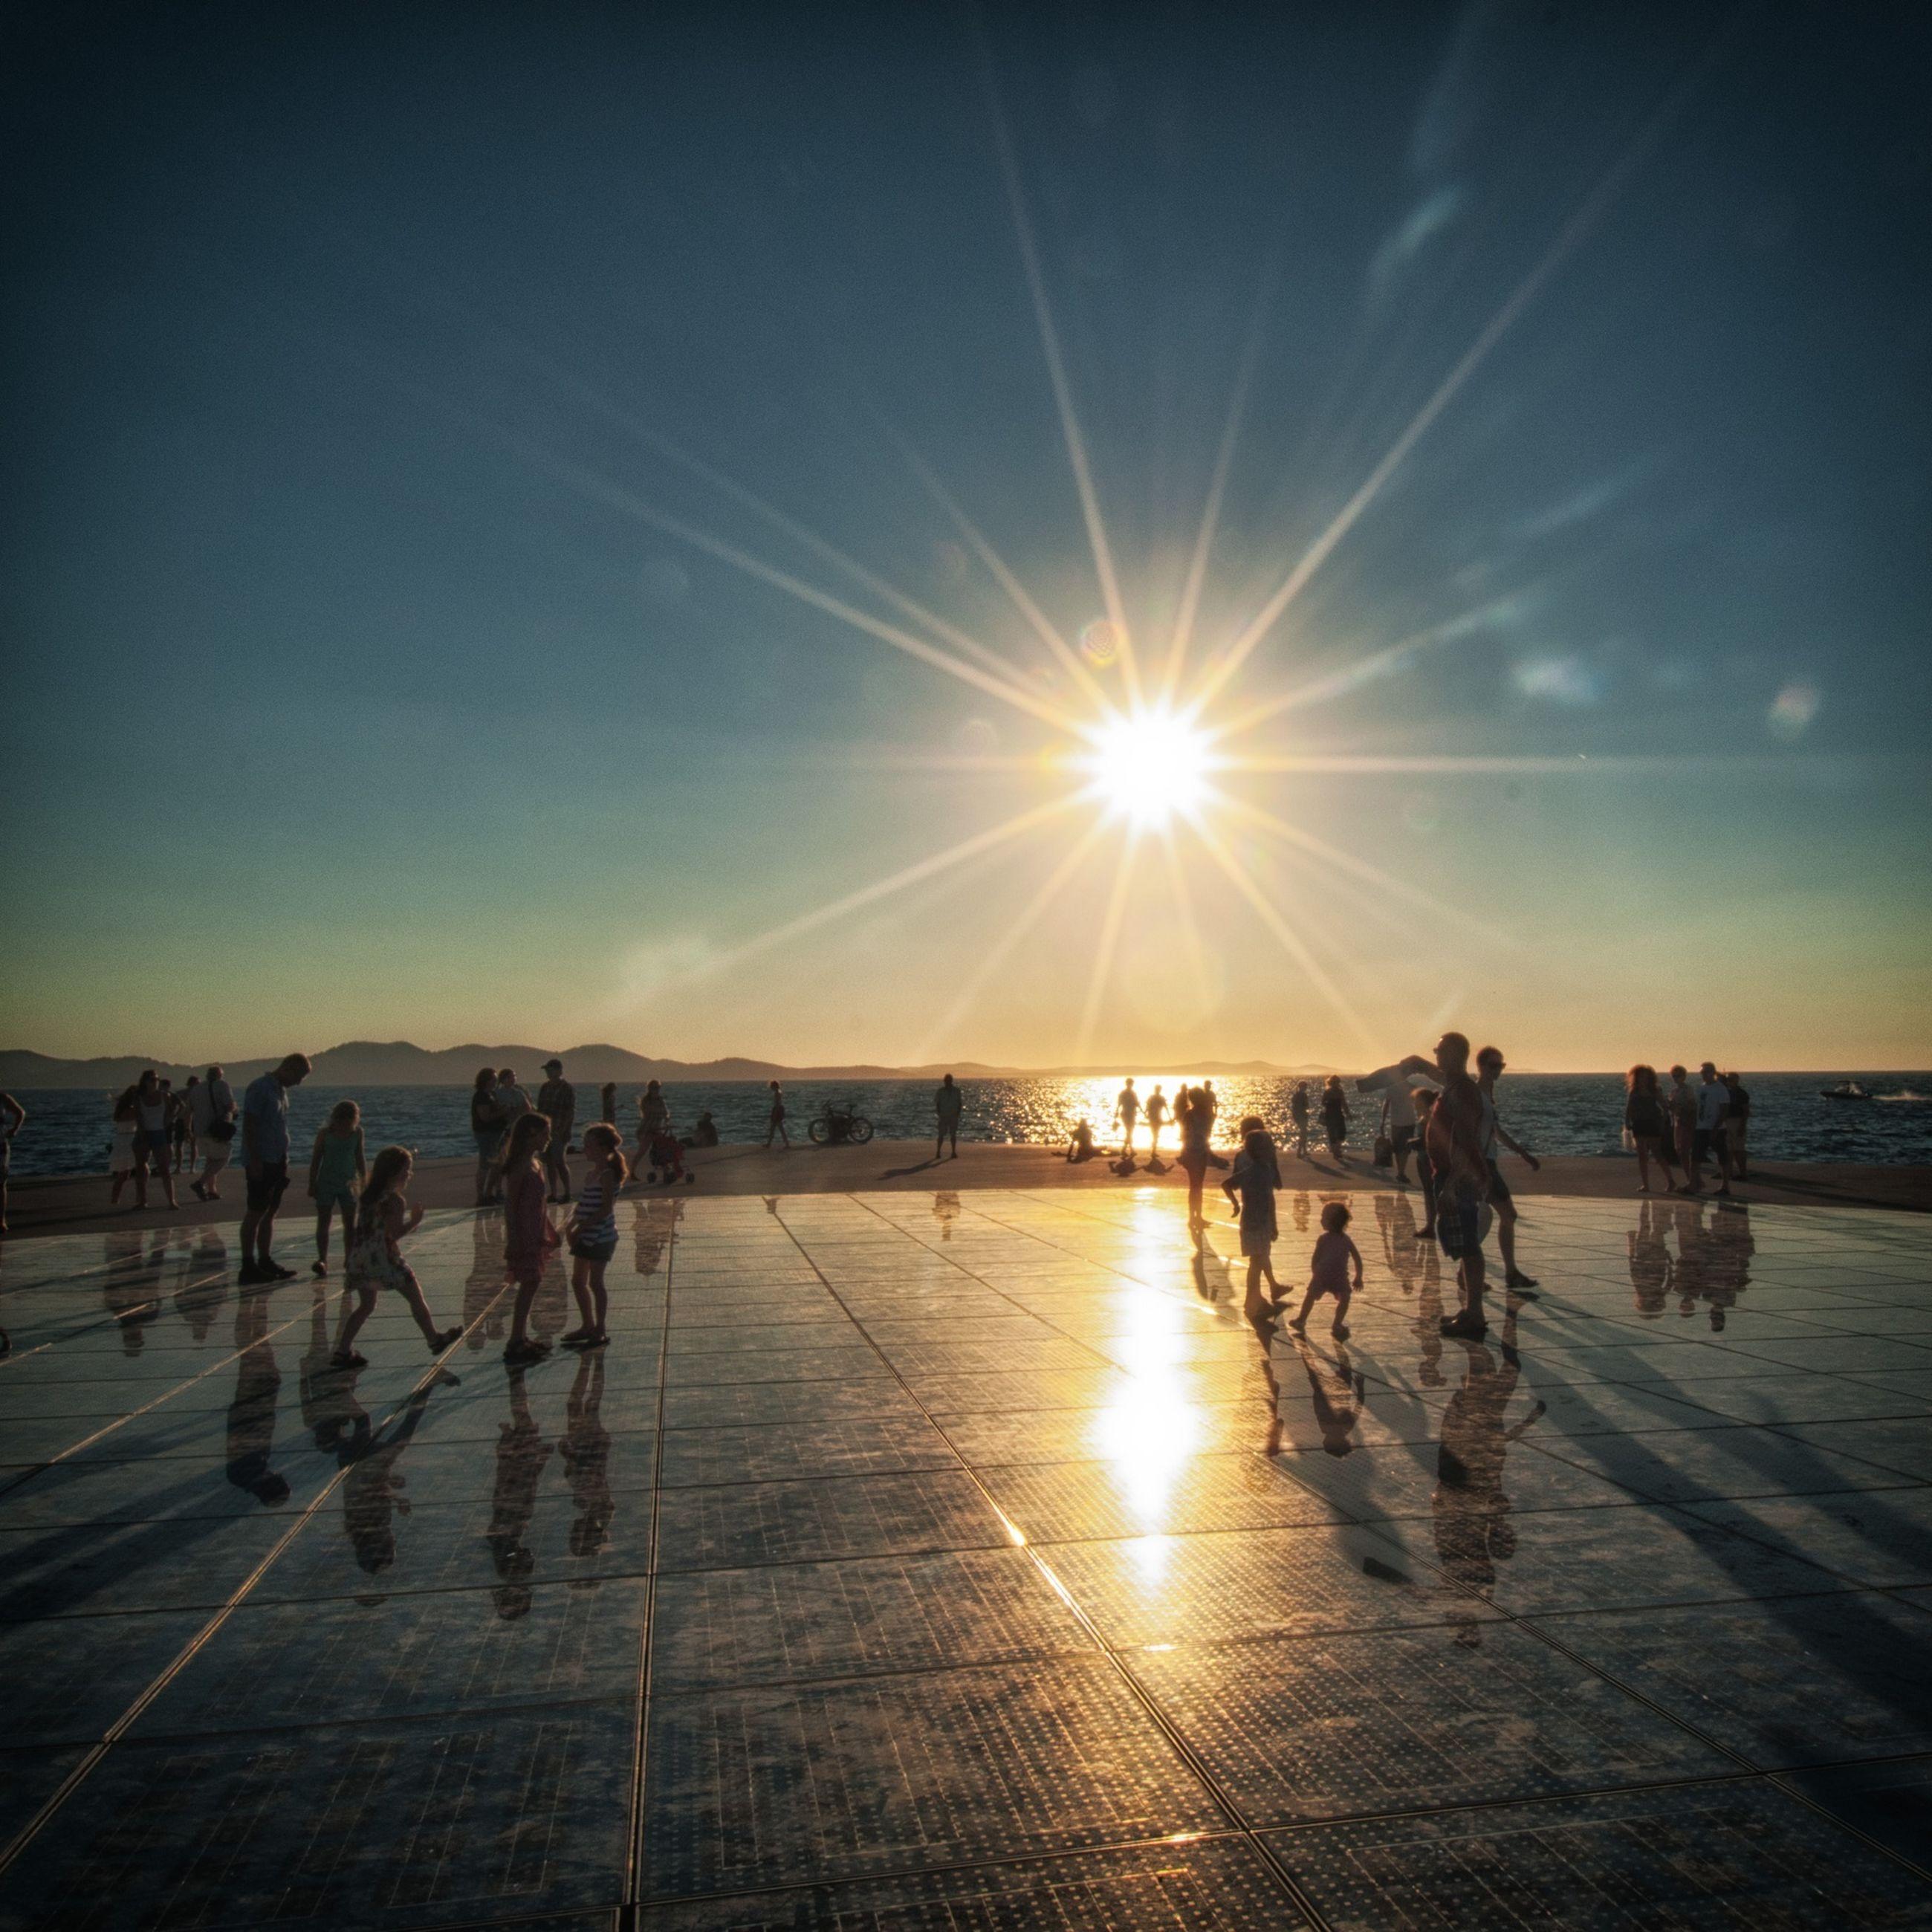 water, sun, beach, large group of people, sea, lifestyles, leisure activity, mixed age range, shore, sunlight, enjoyment, horizon over water, men, vacations, sunbeam, person, sunset, enjoying, medium group of people